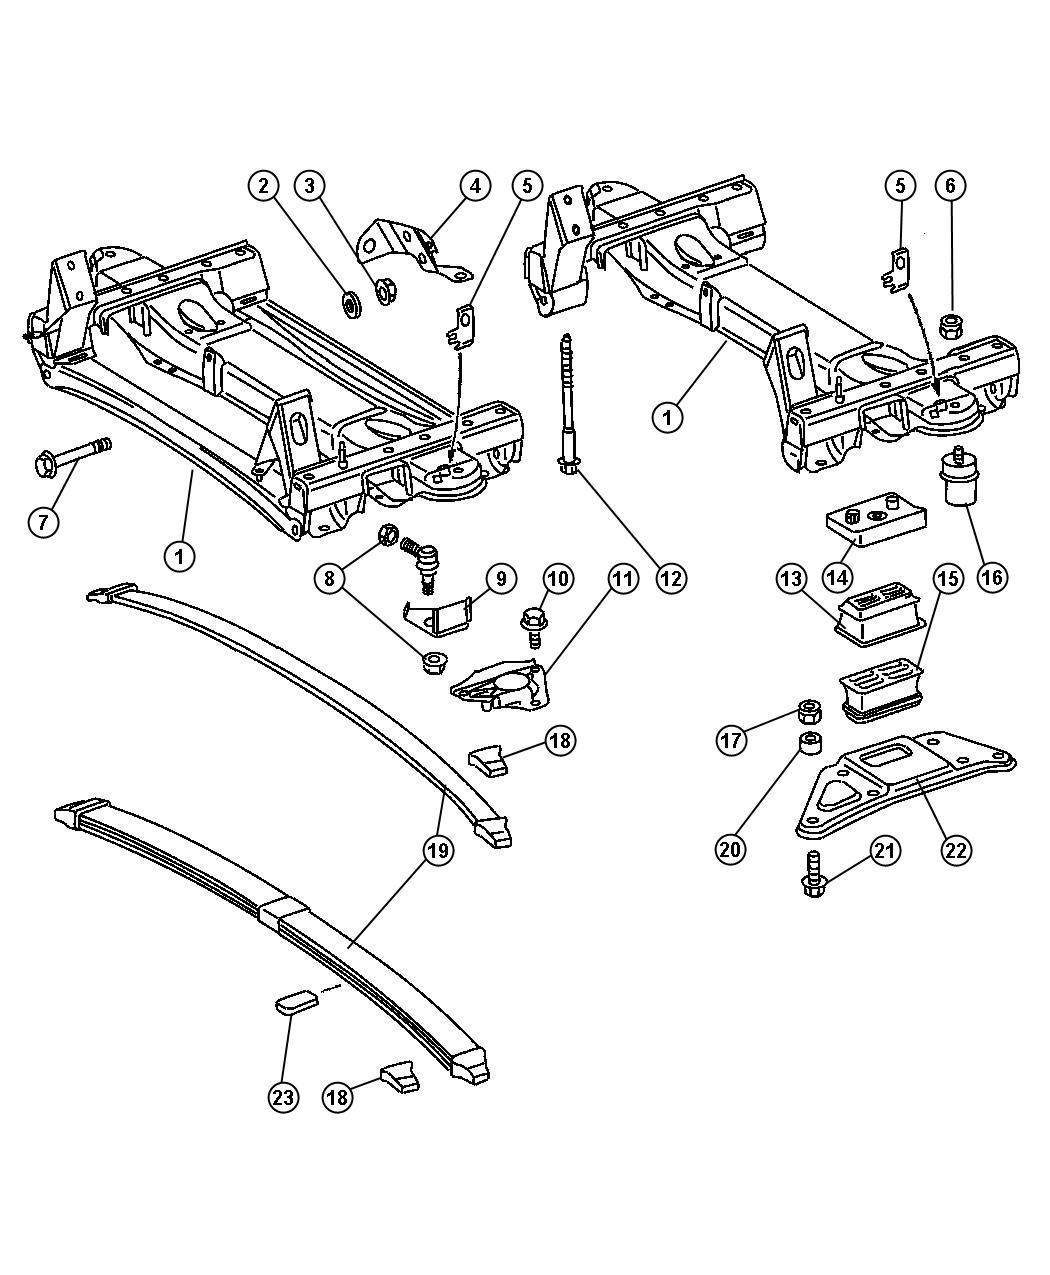 2011 Dodge Ram 3500 Plate  Suspension  Right  Spring